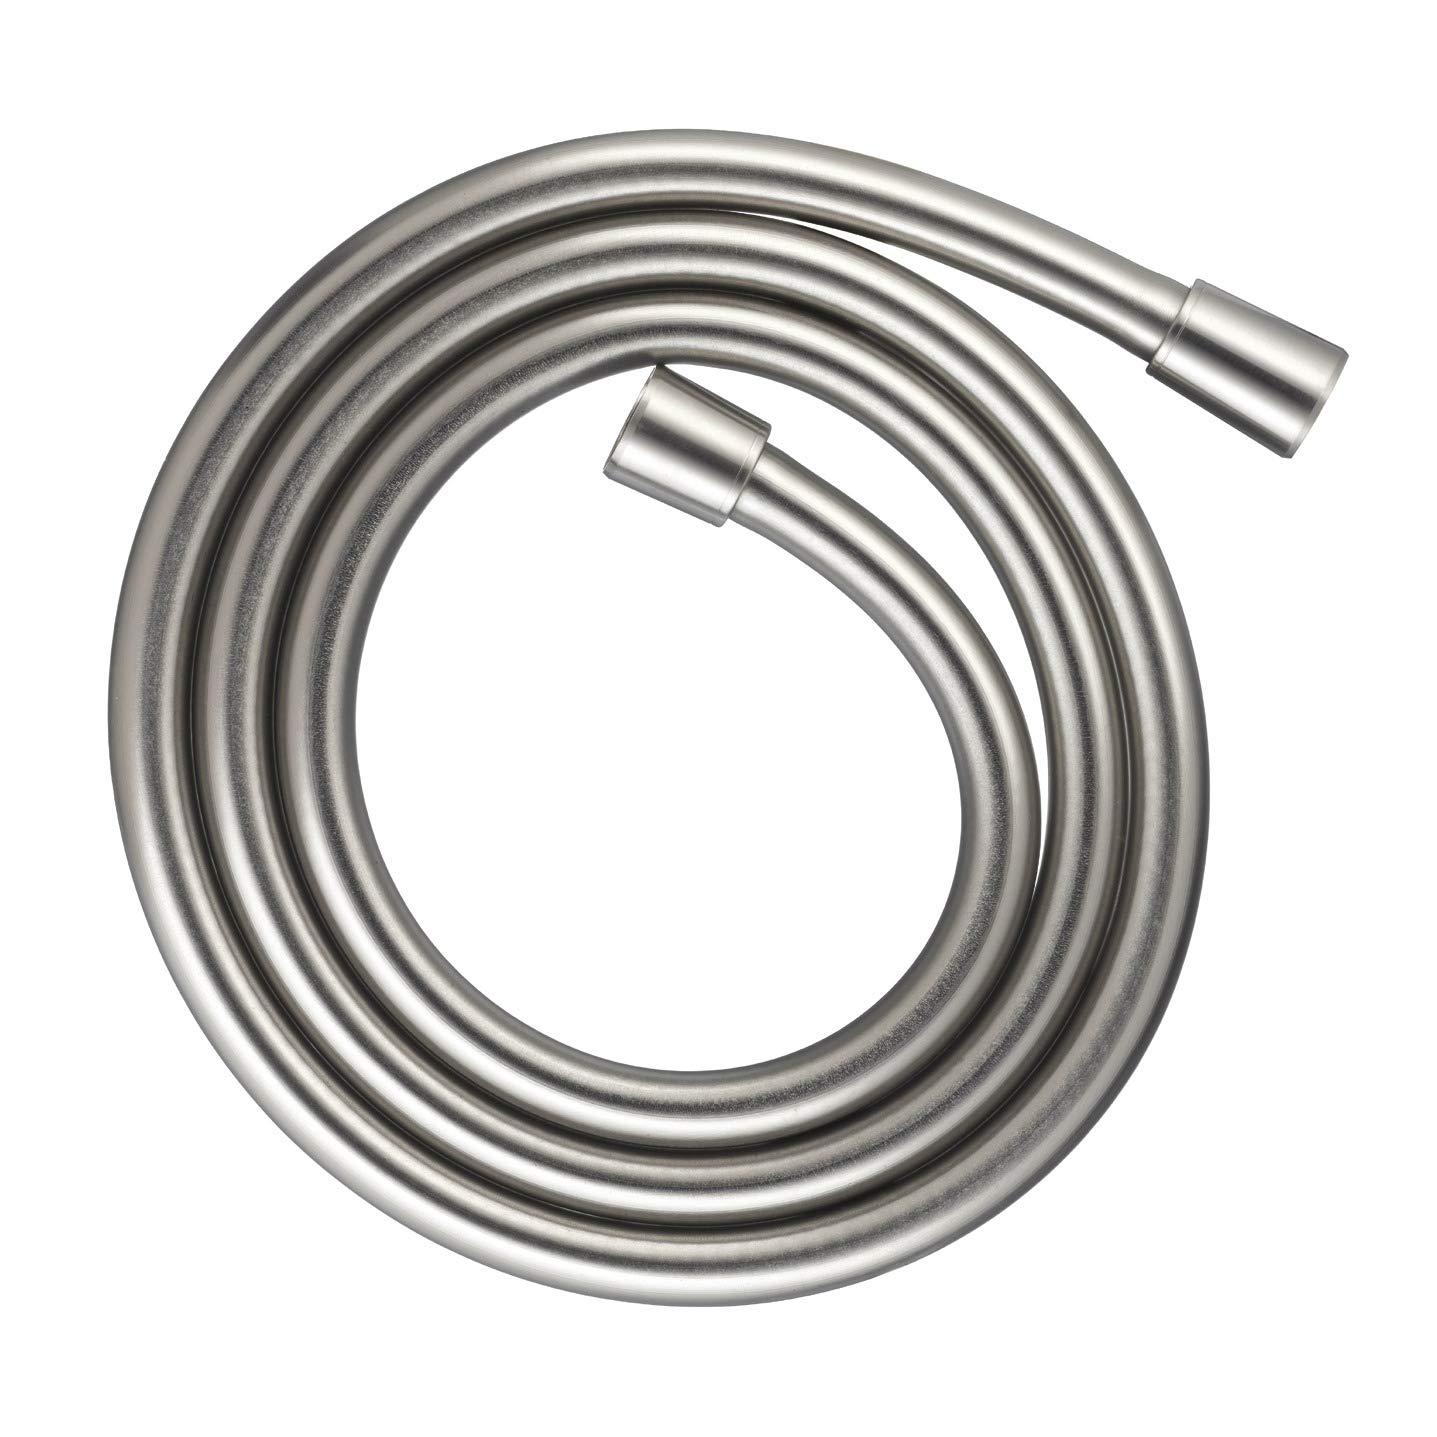 HG Isiflex B shower hose 1600mm